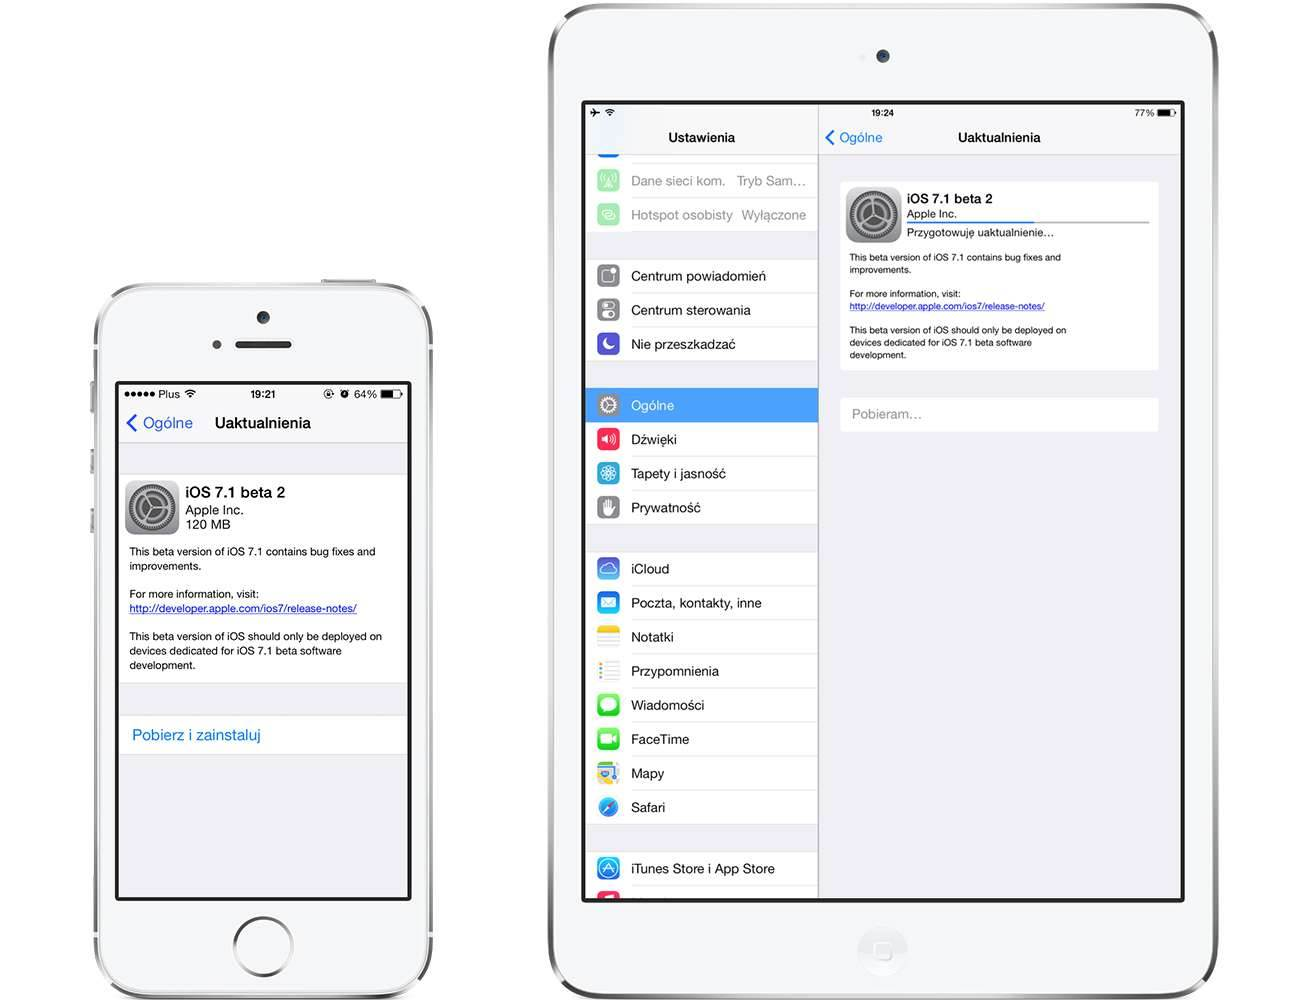 iOS7.1b2